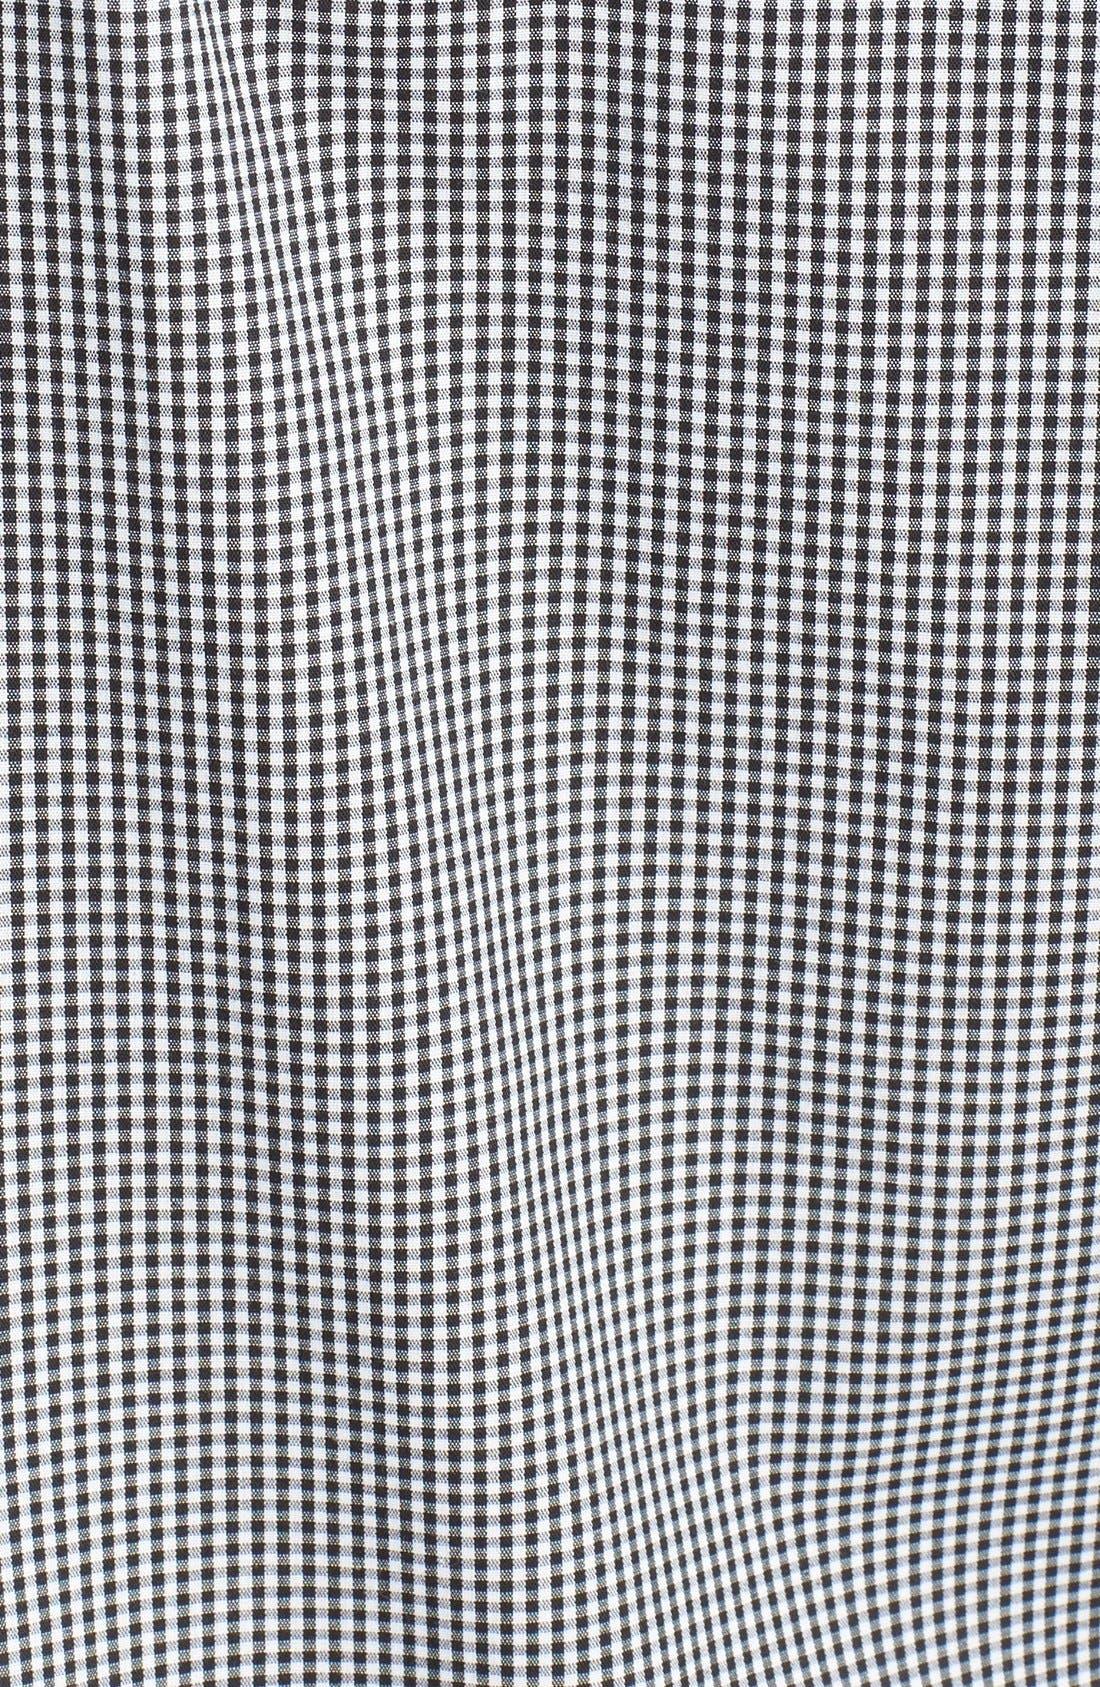 Alternate Image 3  - Topman Slim Fit Mixed Gingham Dress Shirt